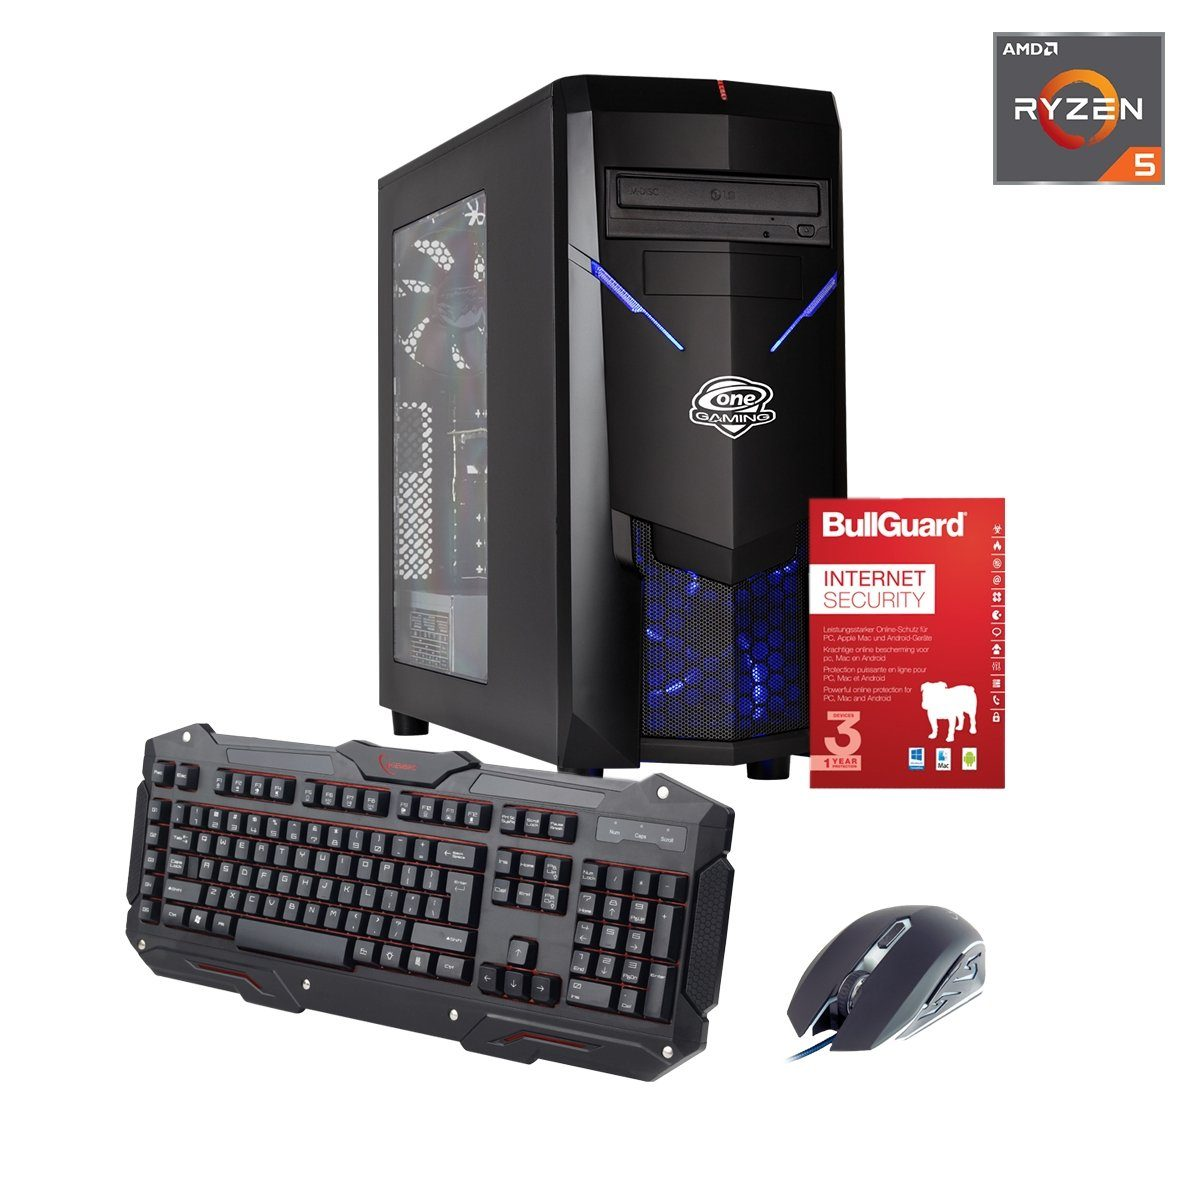 ONE GAMING PC, Ryzen 5 2600X, GeForce RTX 2080, 32GB DDR4 RAM »PC 44722«